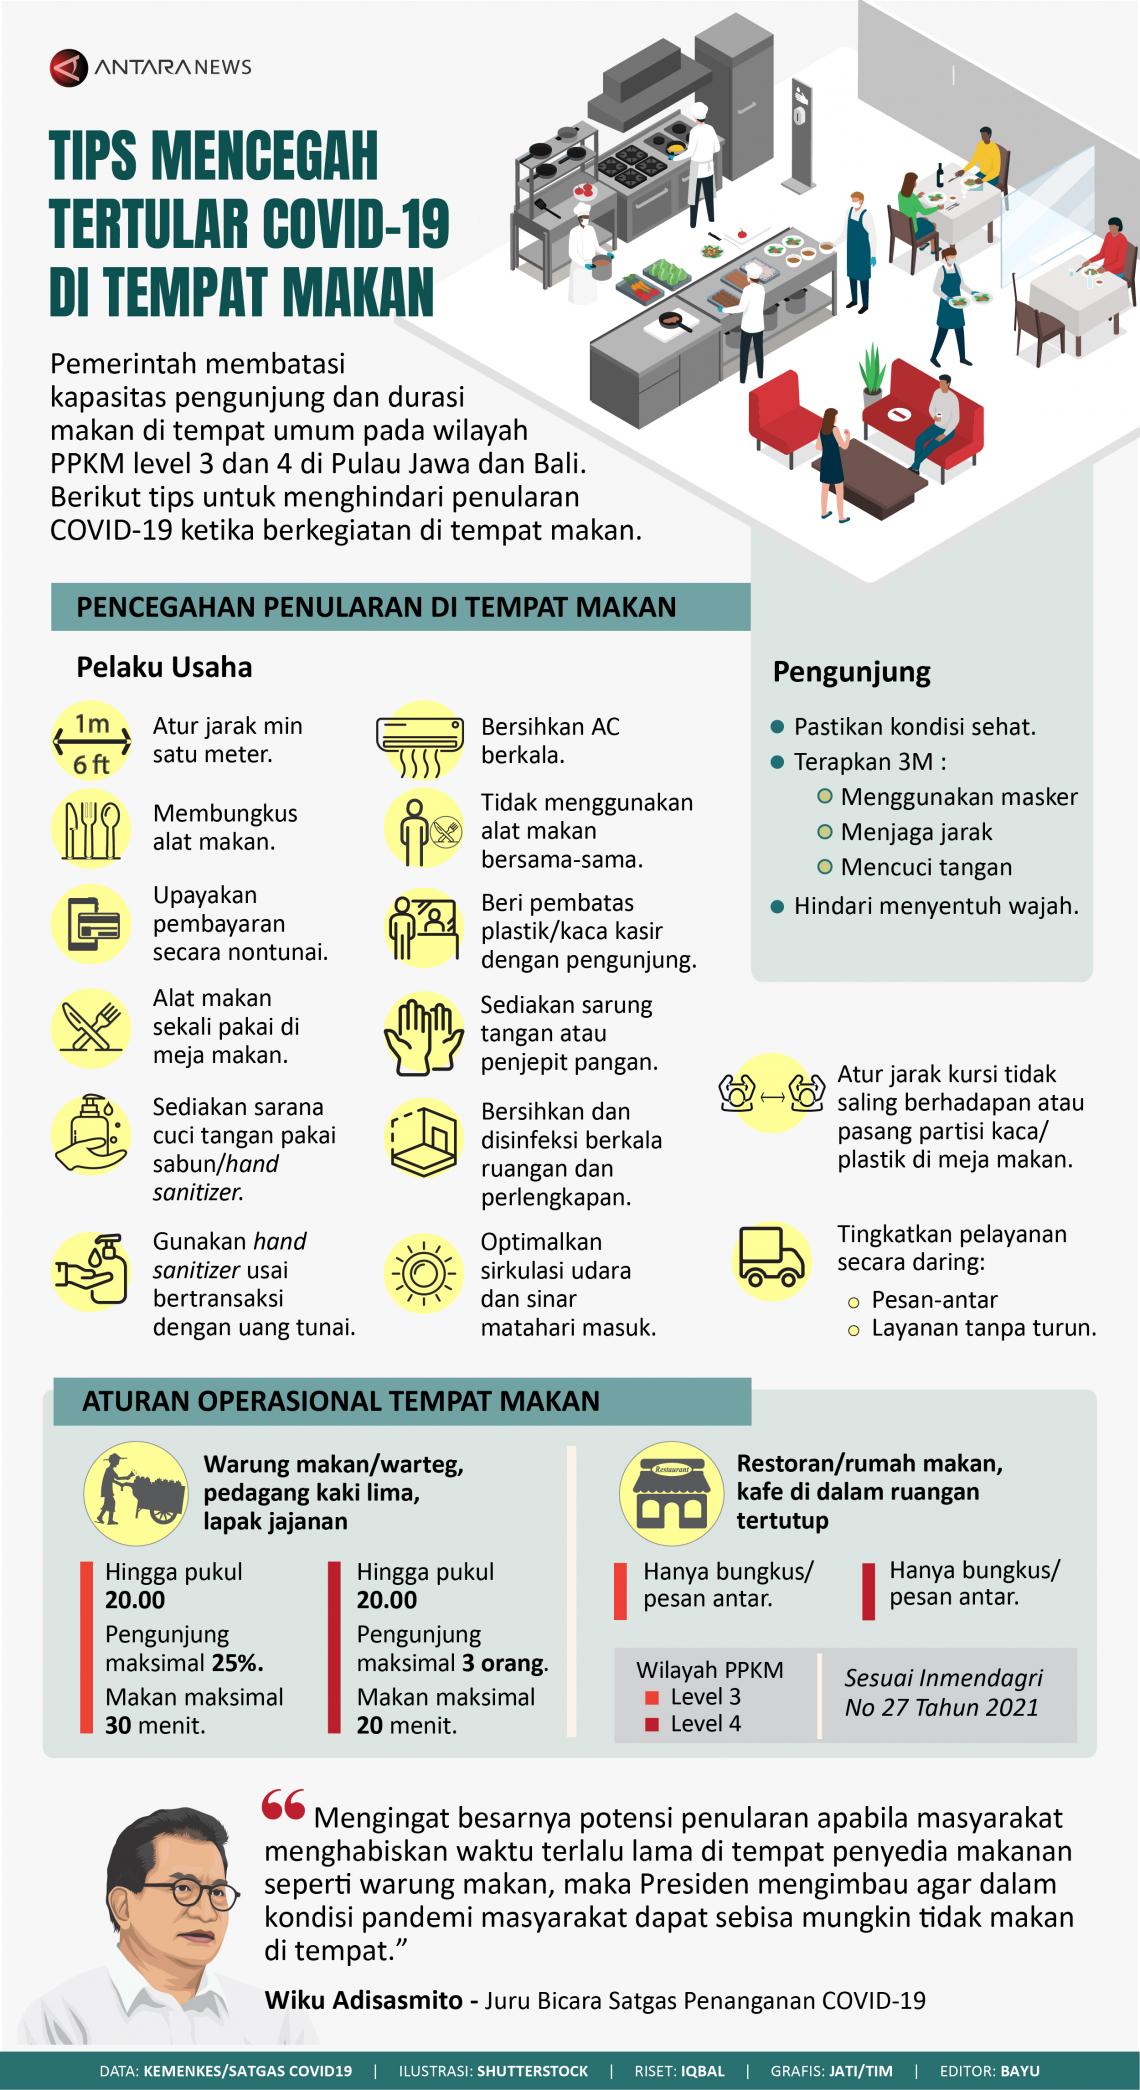 Tips mencegah tertular COVID-19 di tempat makan